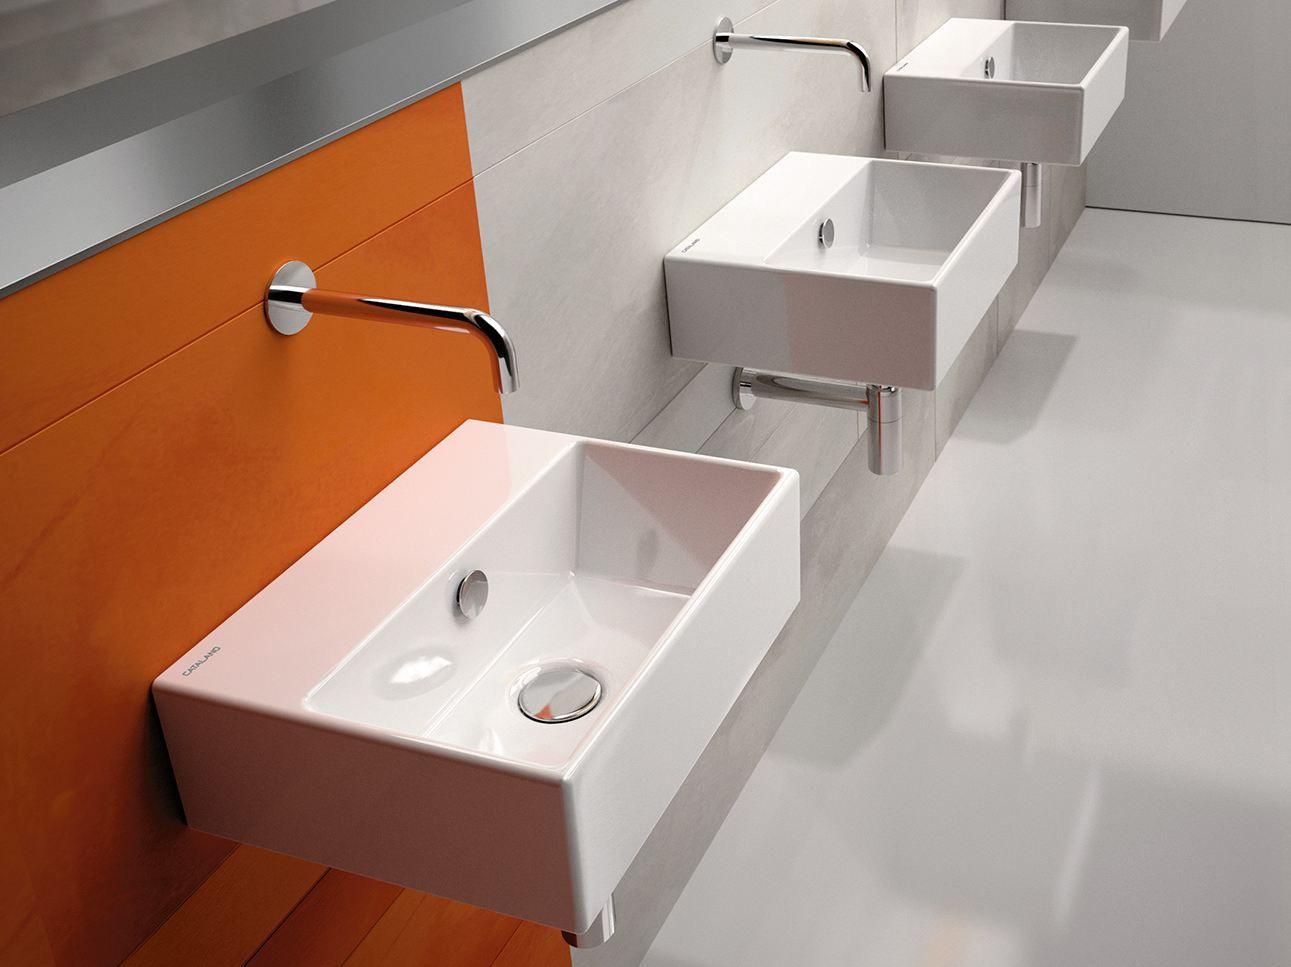 Premium 40 lavabo by ceramica catalano for Lavabos de ceramica